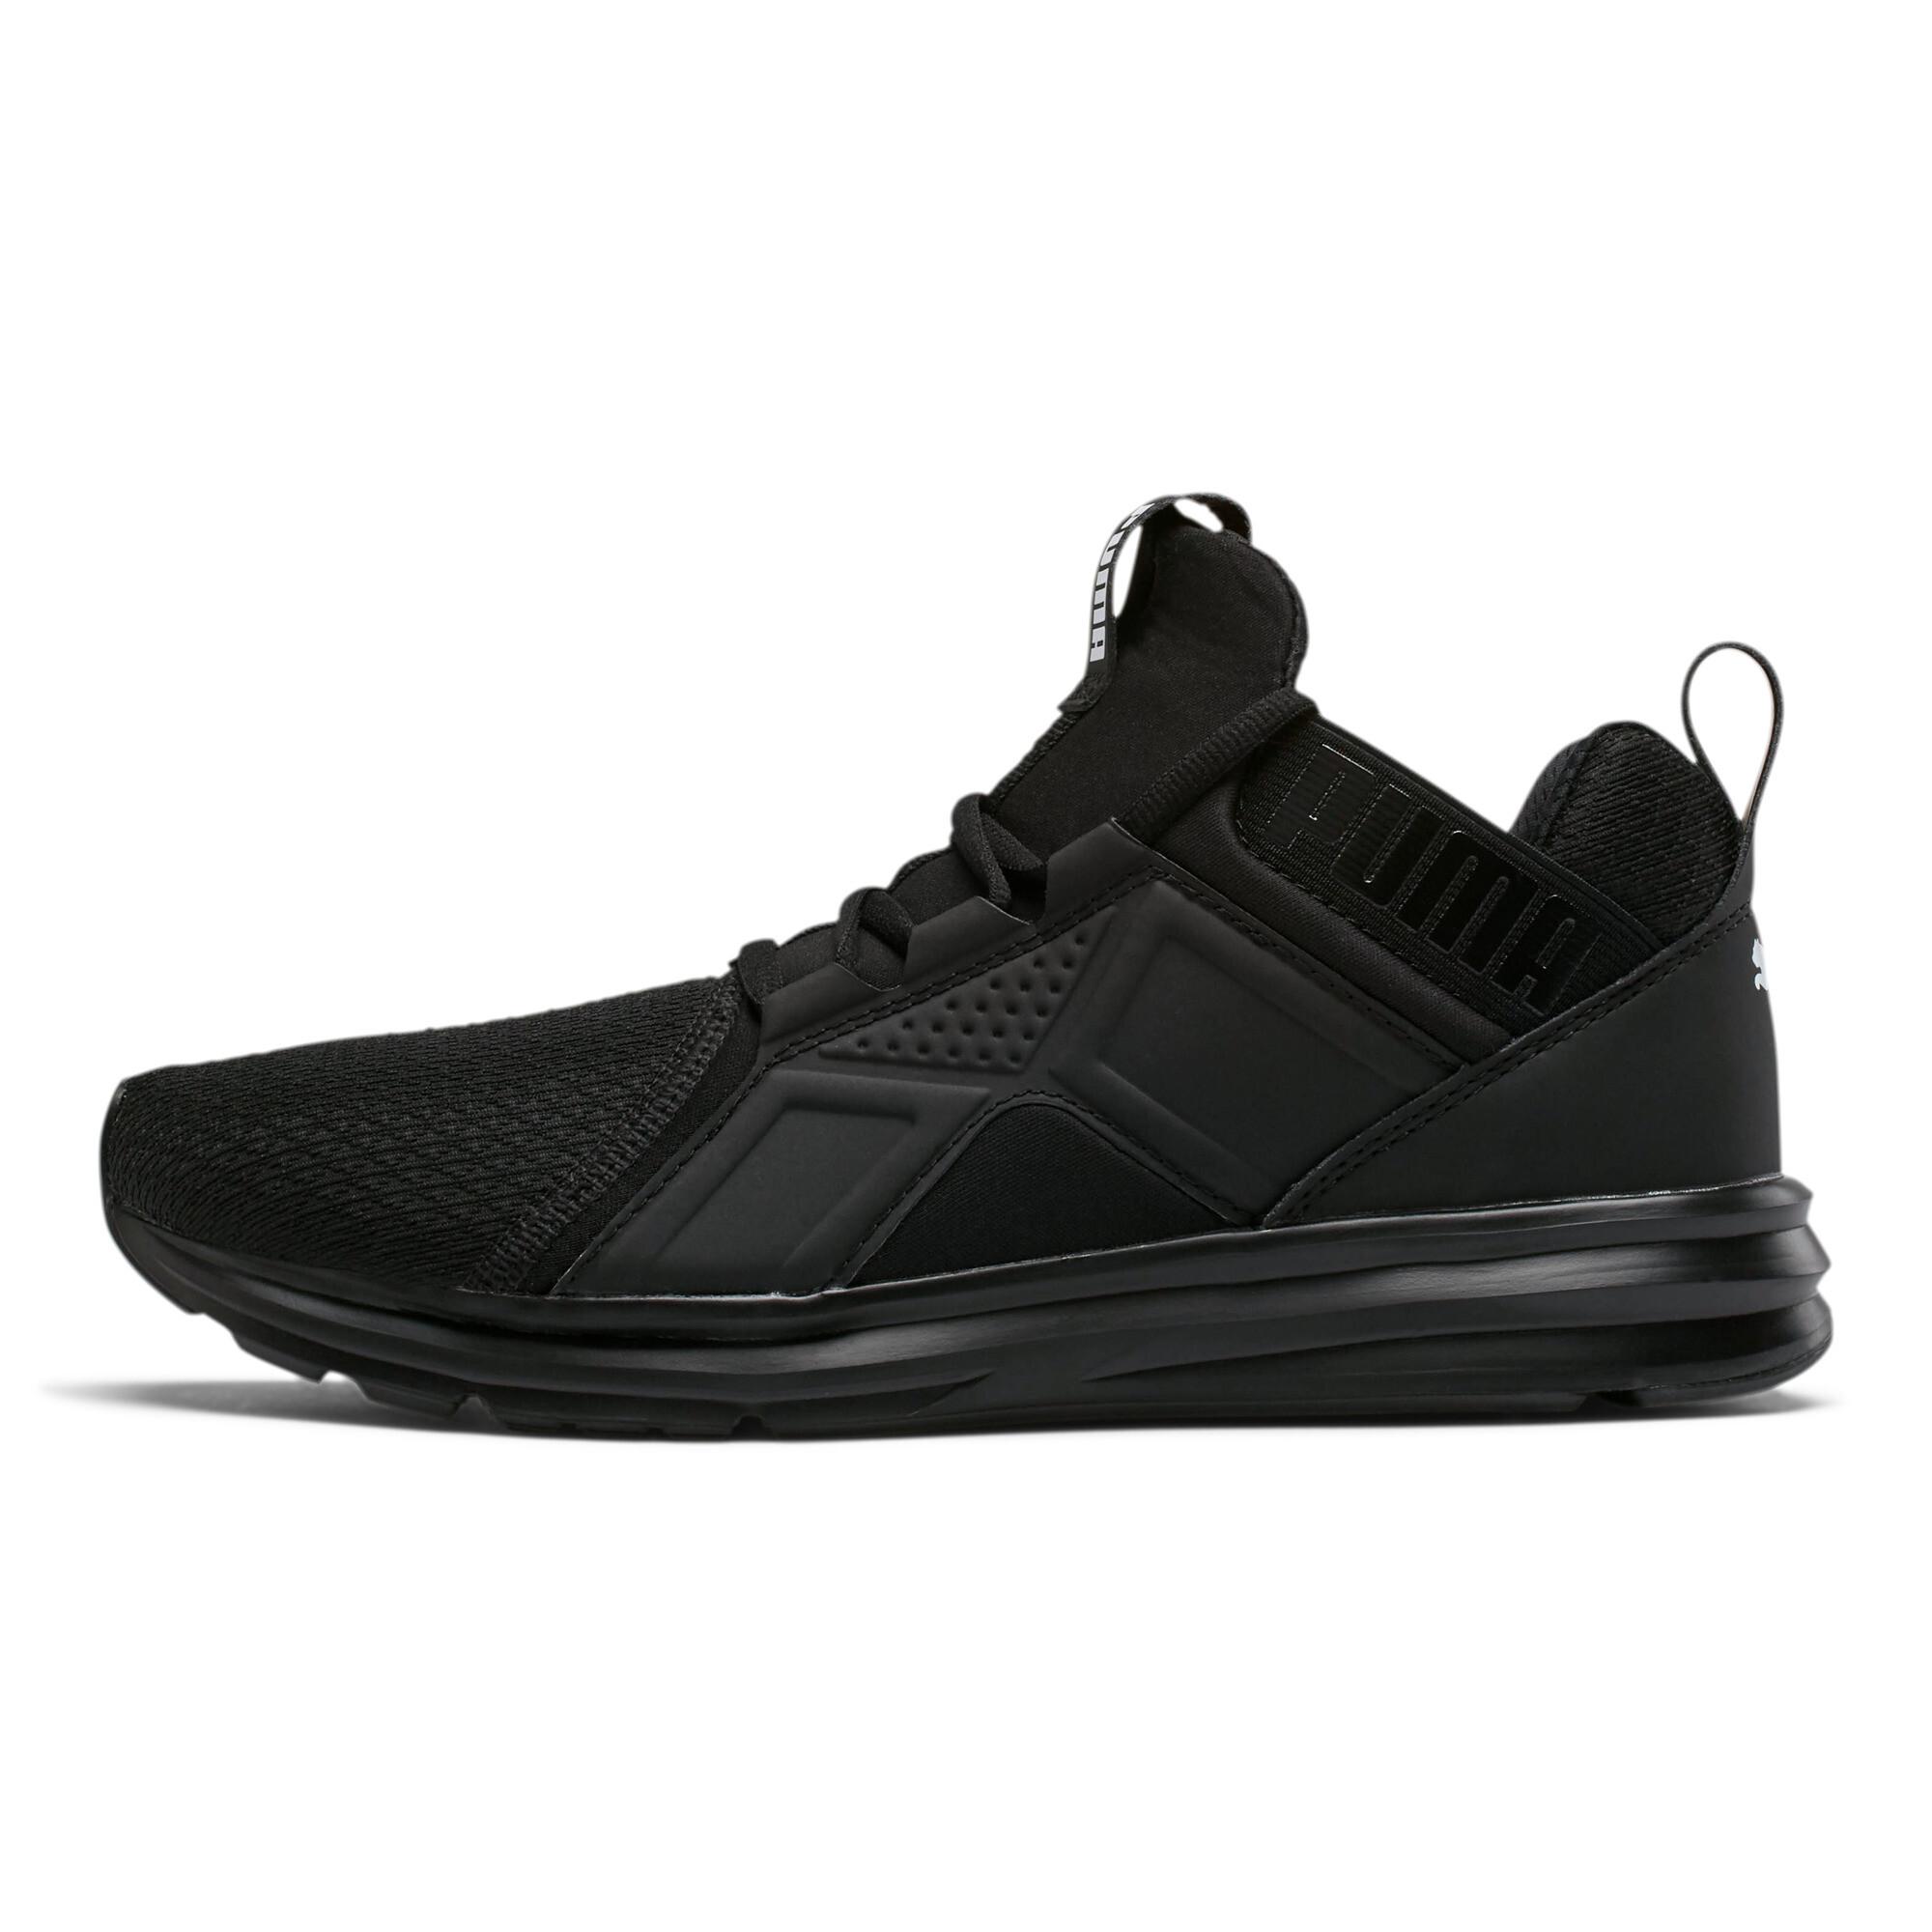 PUMA-Men-039-s-Enzo-Training-Shoes thumbnail 4